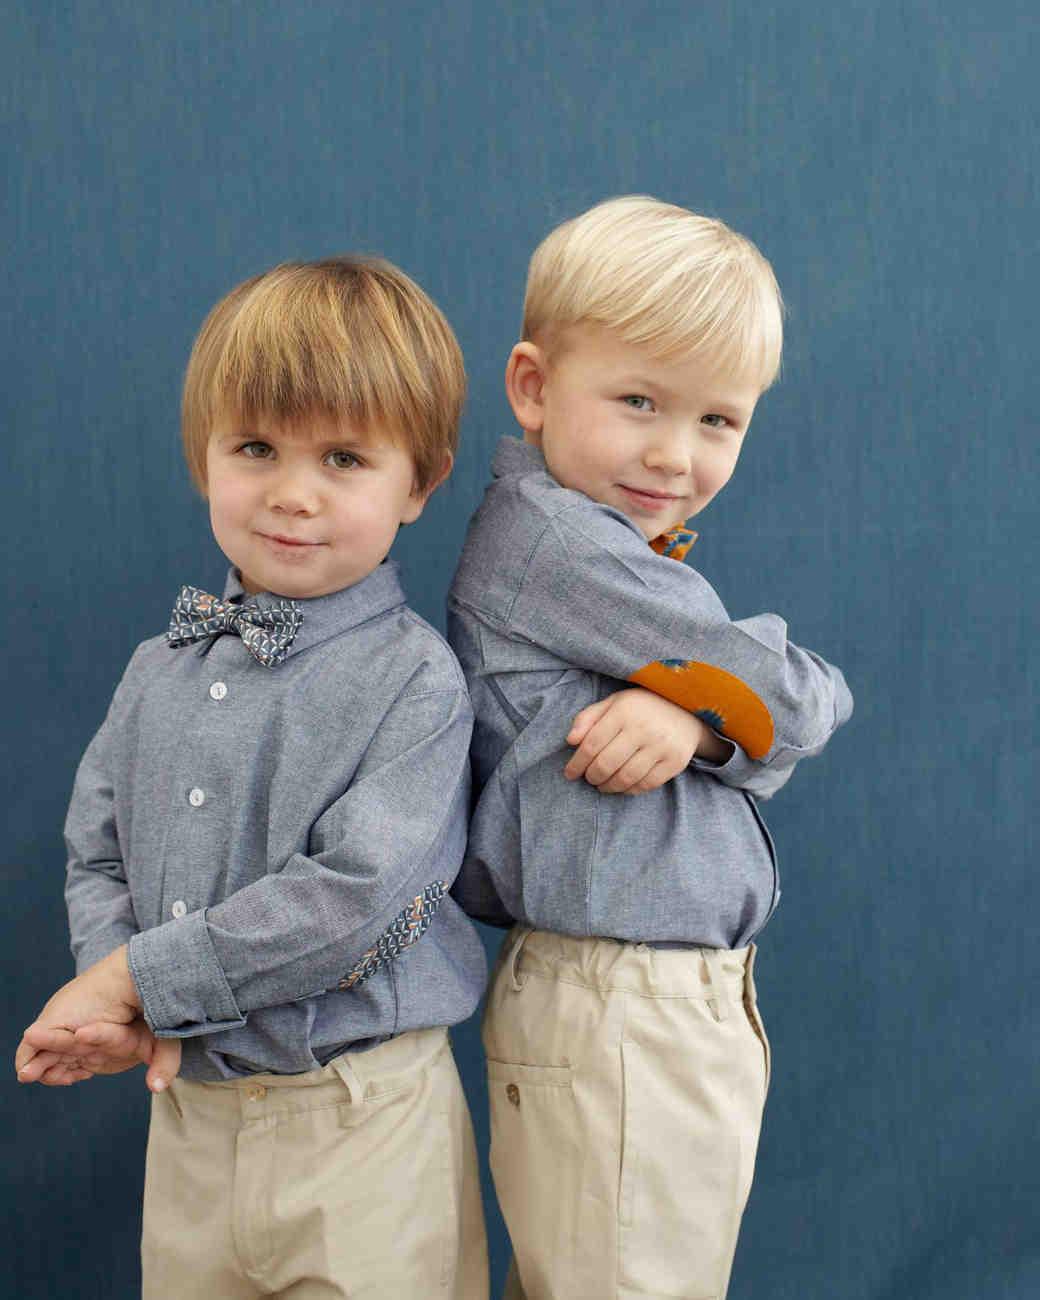 boybow-fabric-sum11wd107042-203.jpg